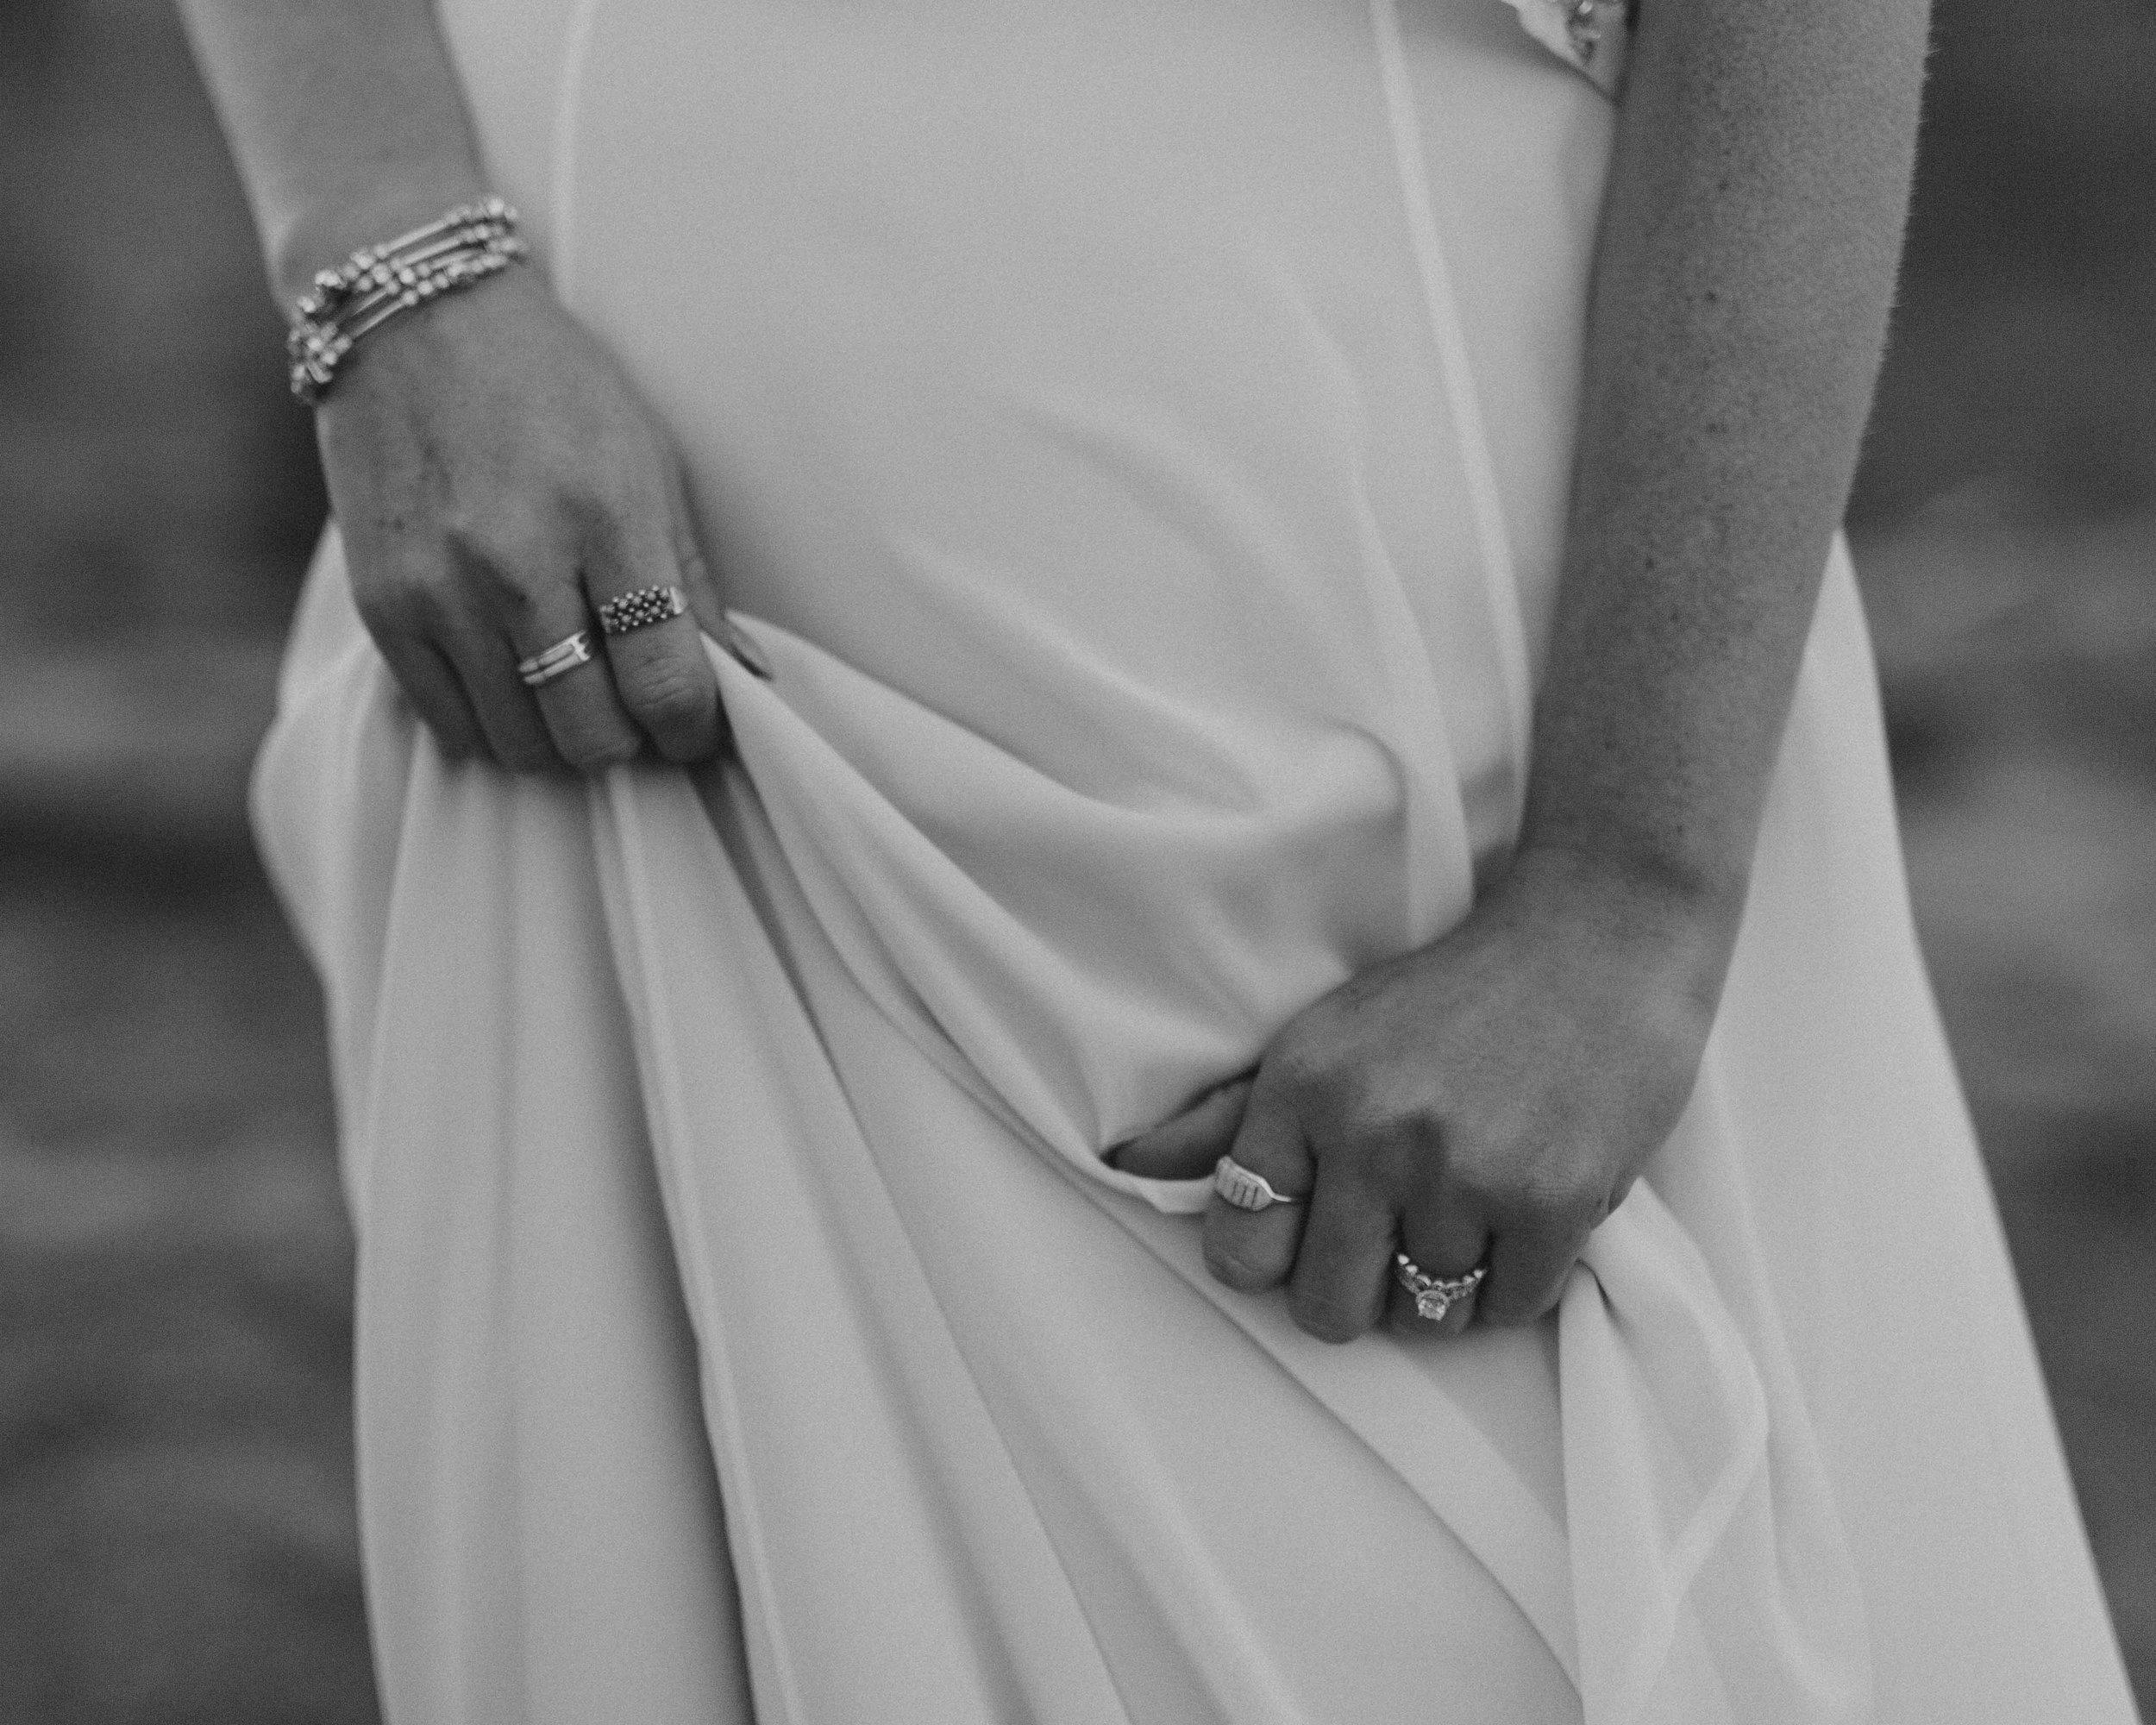 moab-wedding-photographer-54.jpg